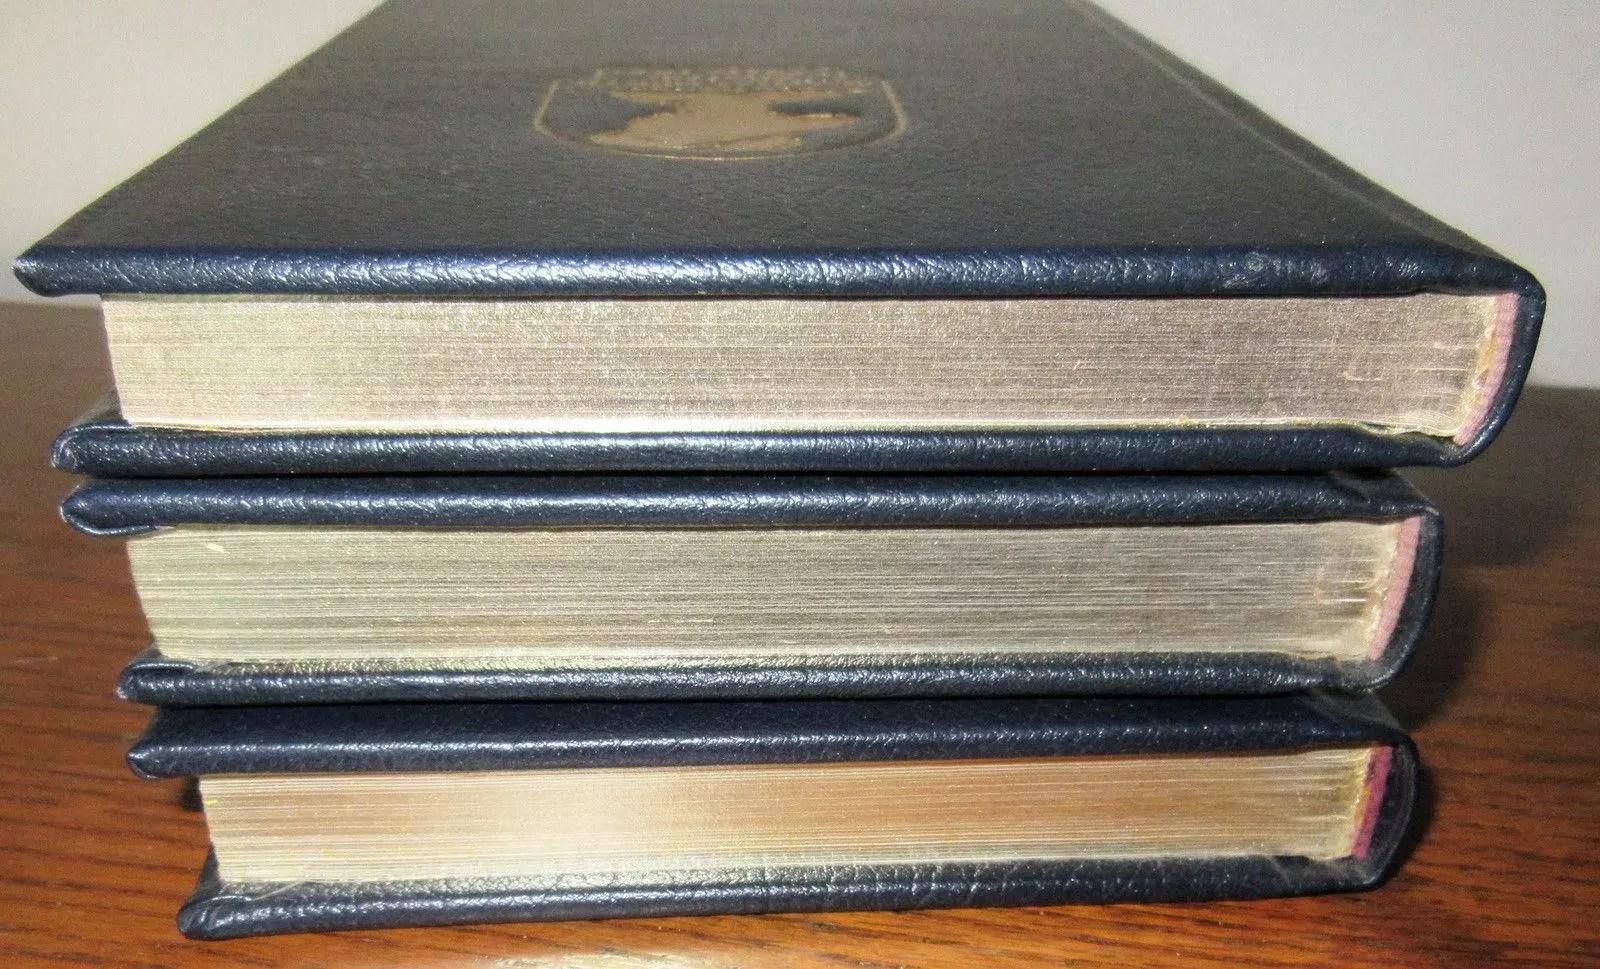 agatha christie bantam books deluxe gilt edges